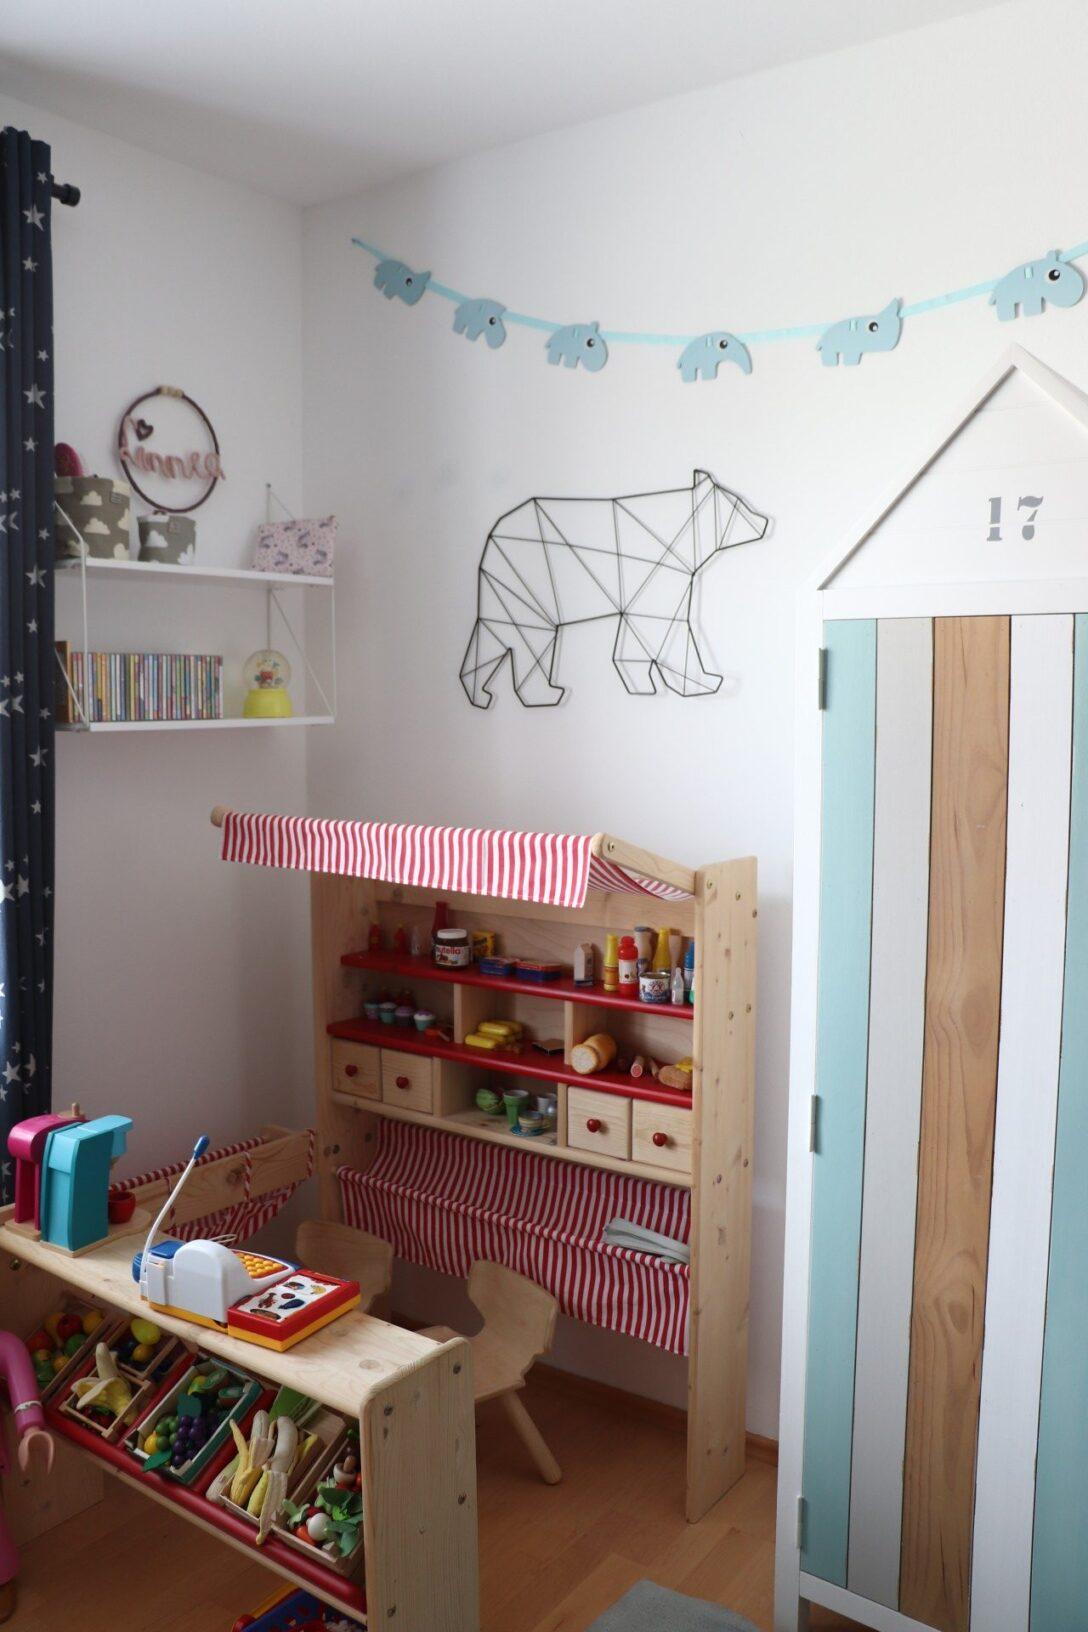 Large Size of Wanddeko Kinderzimmer Ideen Lavendelblog Sofa Regal Regale Küche Weiß Kinderzimmer Kinderzimmer Wanddeko